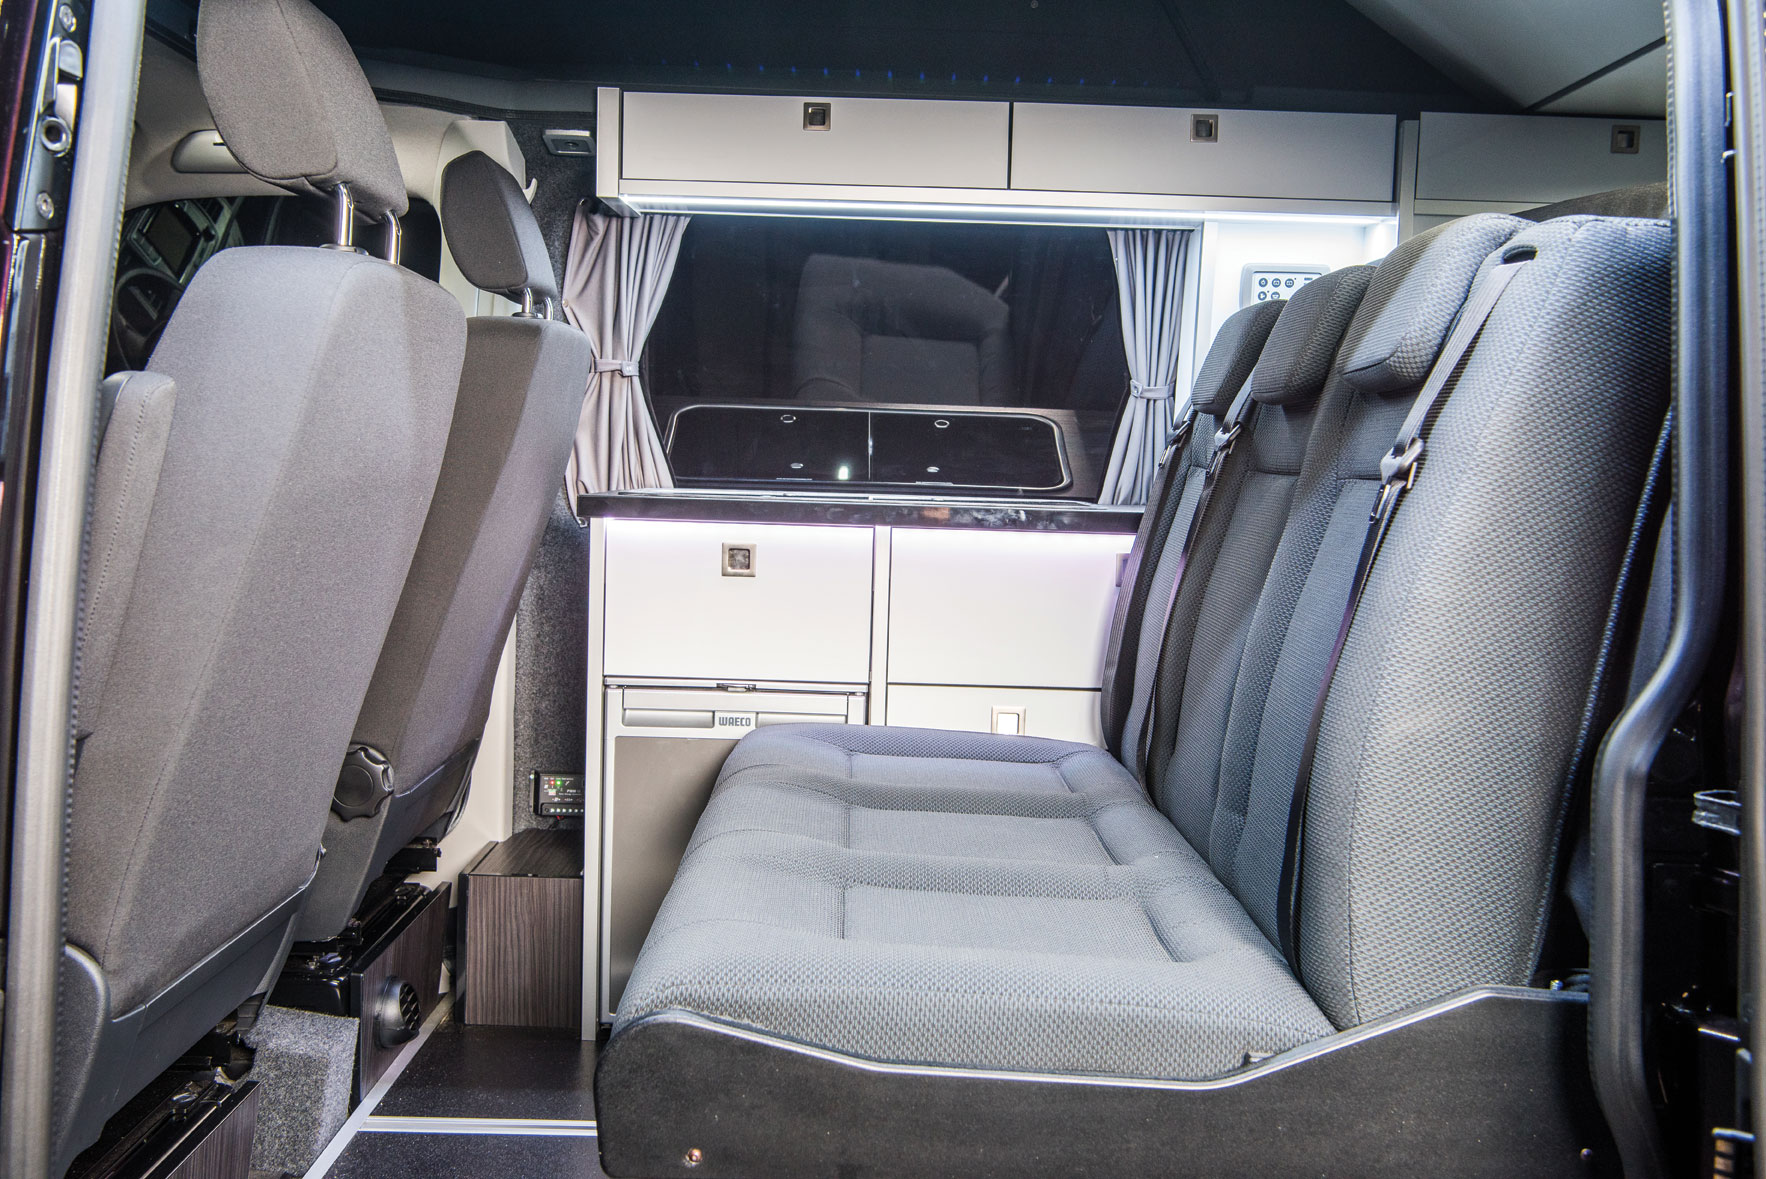 Sliding Seat System Vw T5 Camper Conversion Company